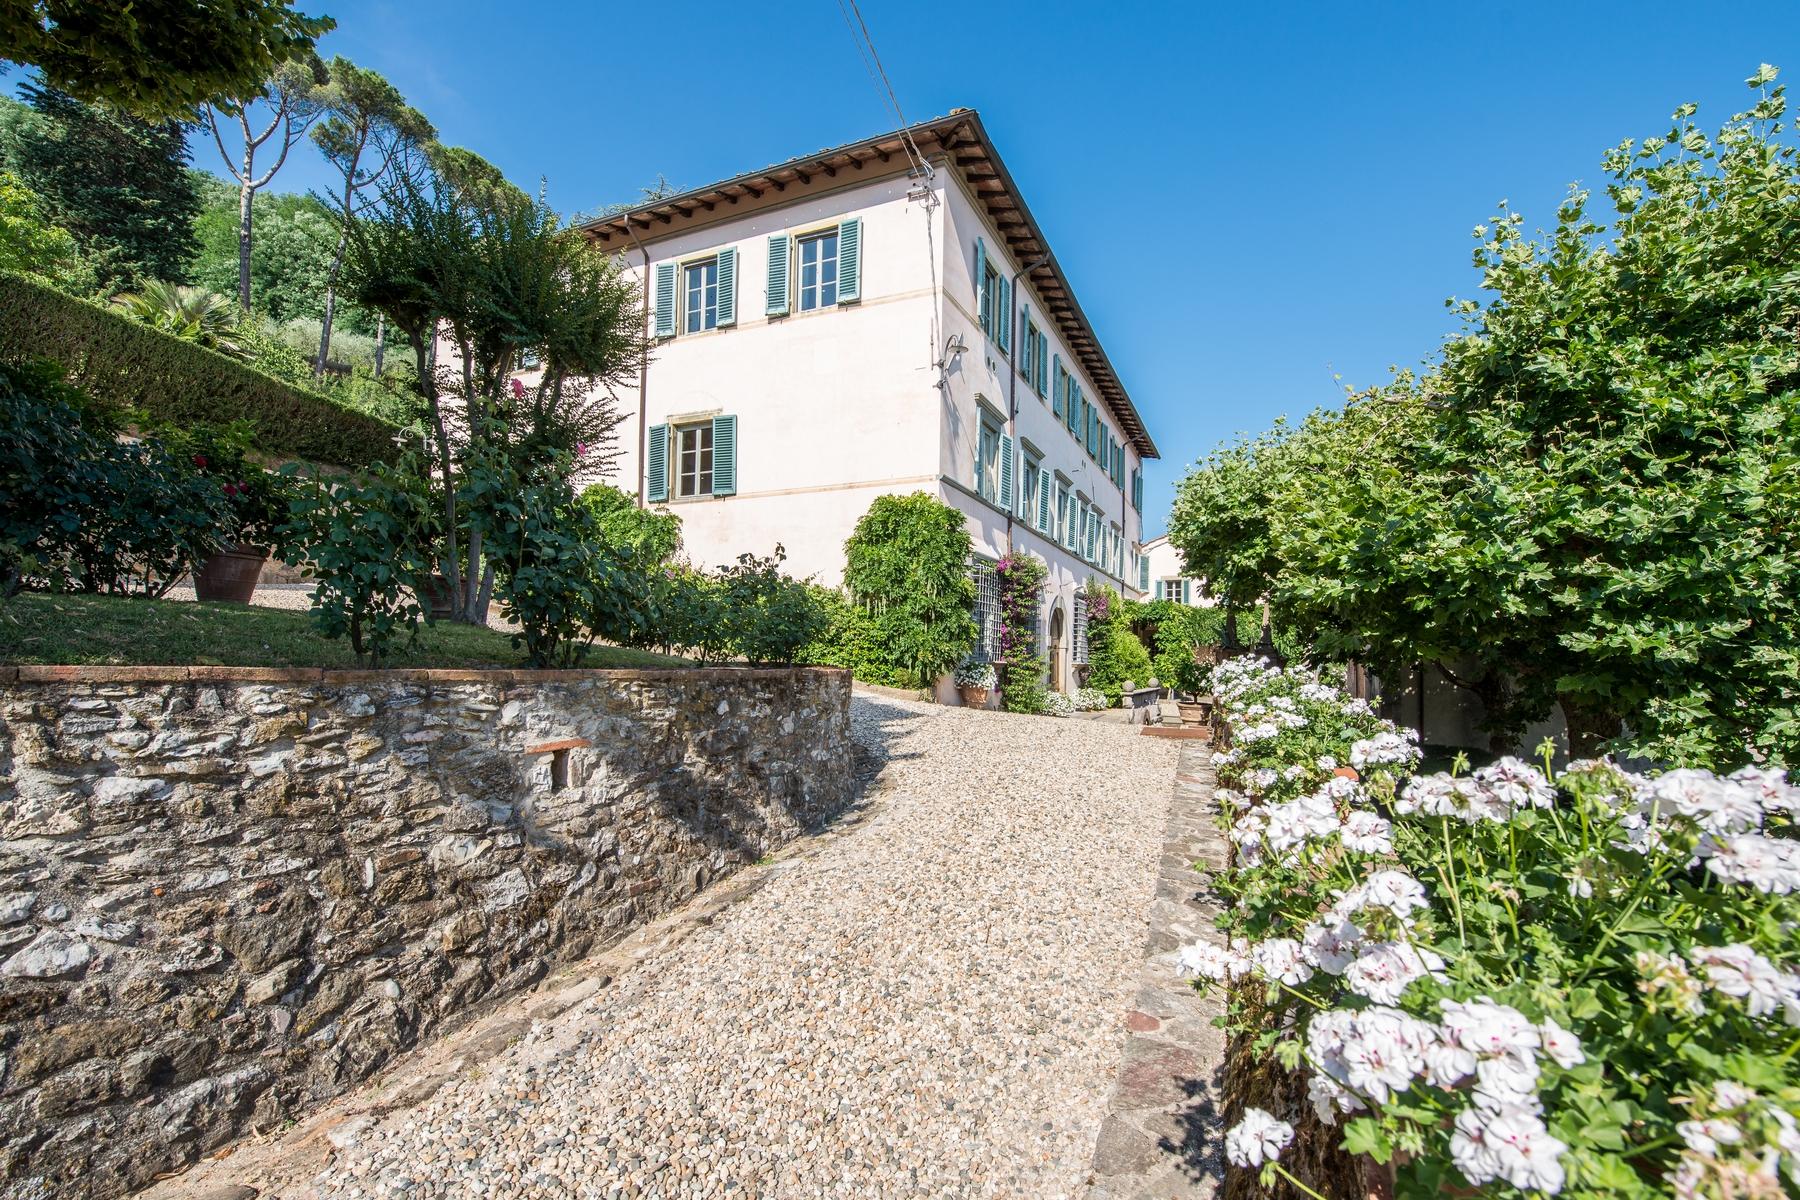 Villa in Vendita a Lucca: 5 locali, 2500 mq - Foto 20